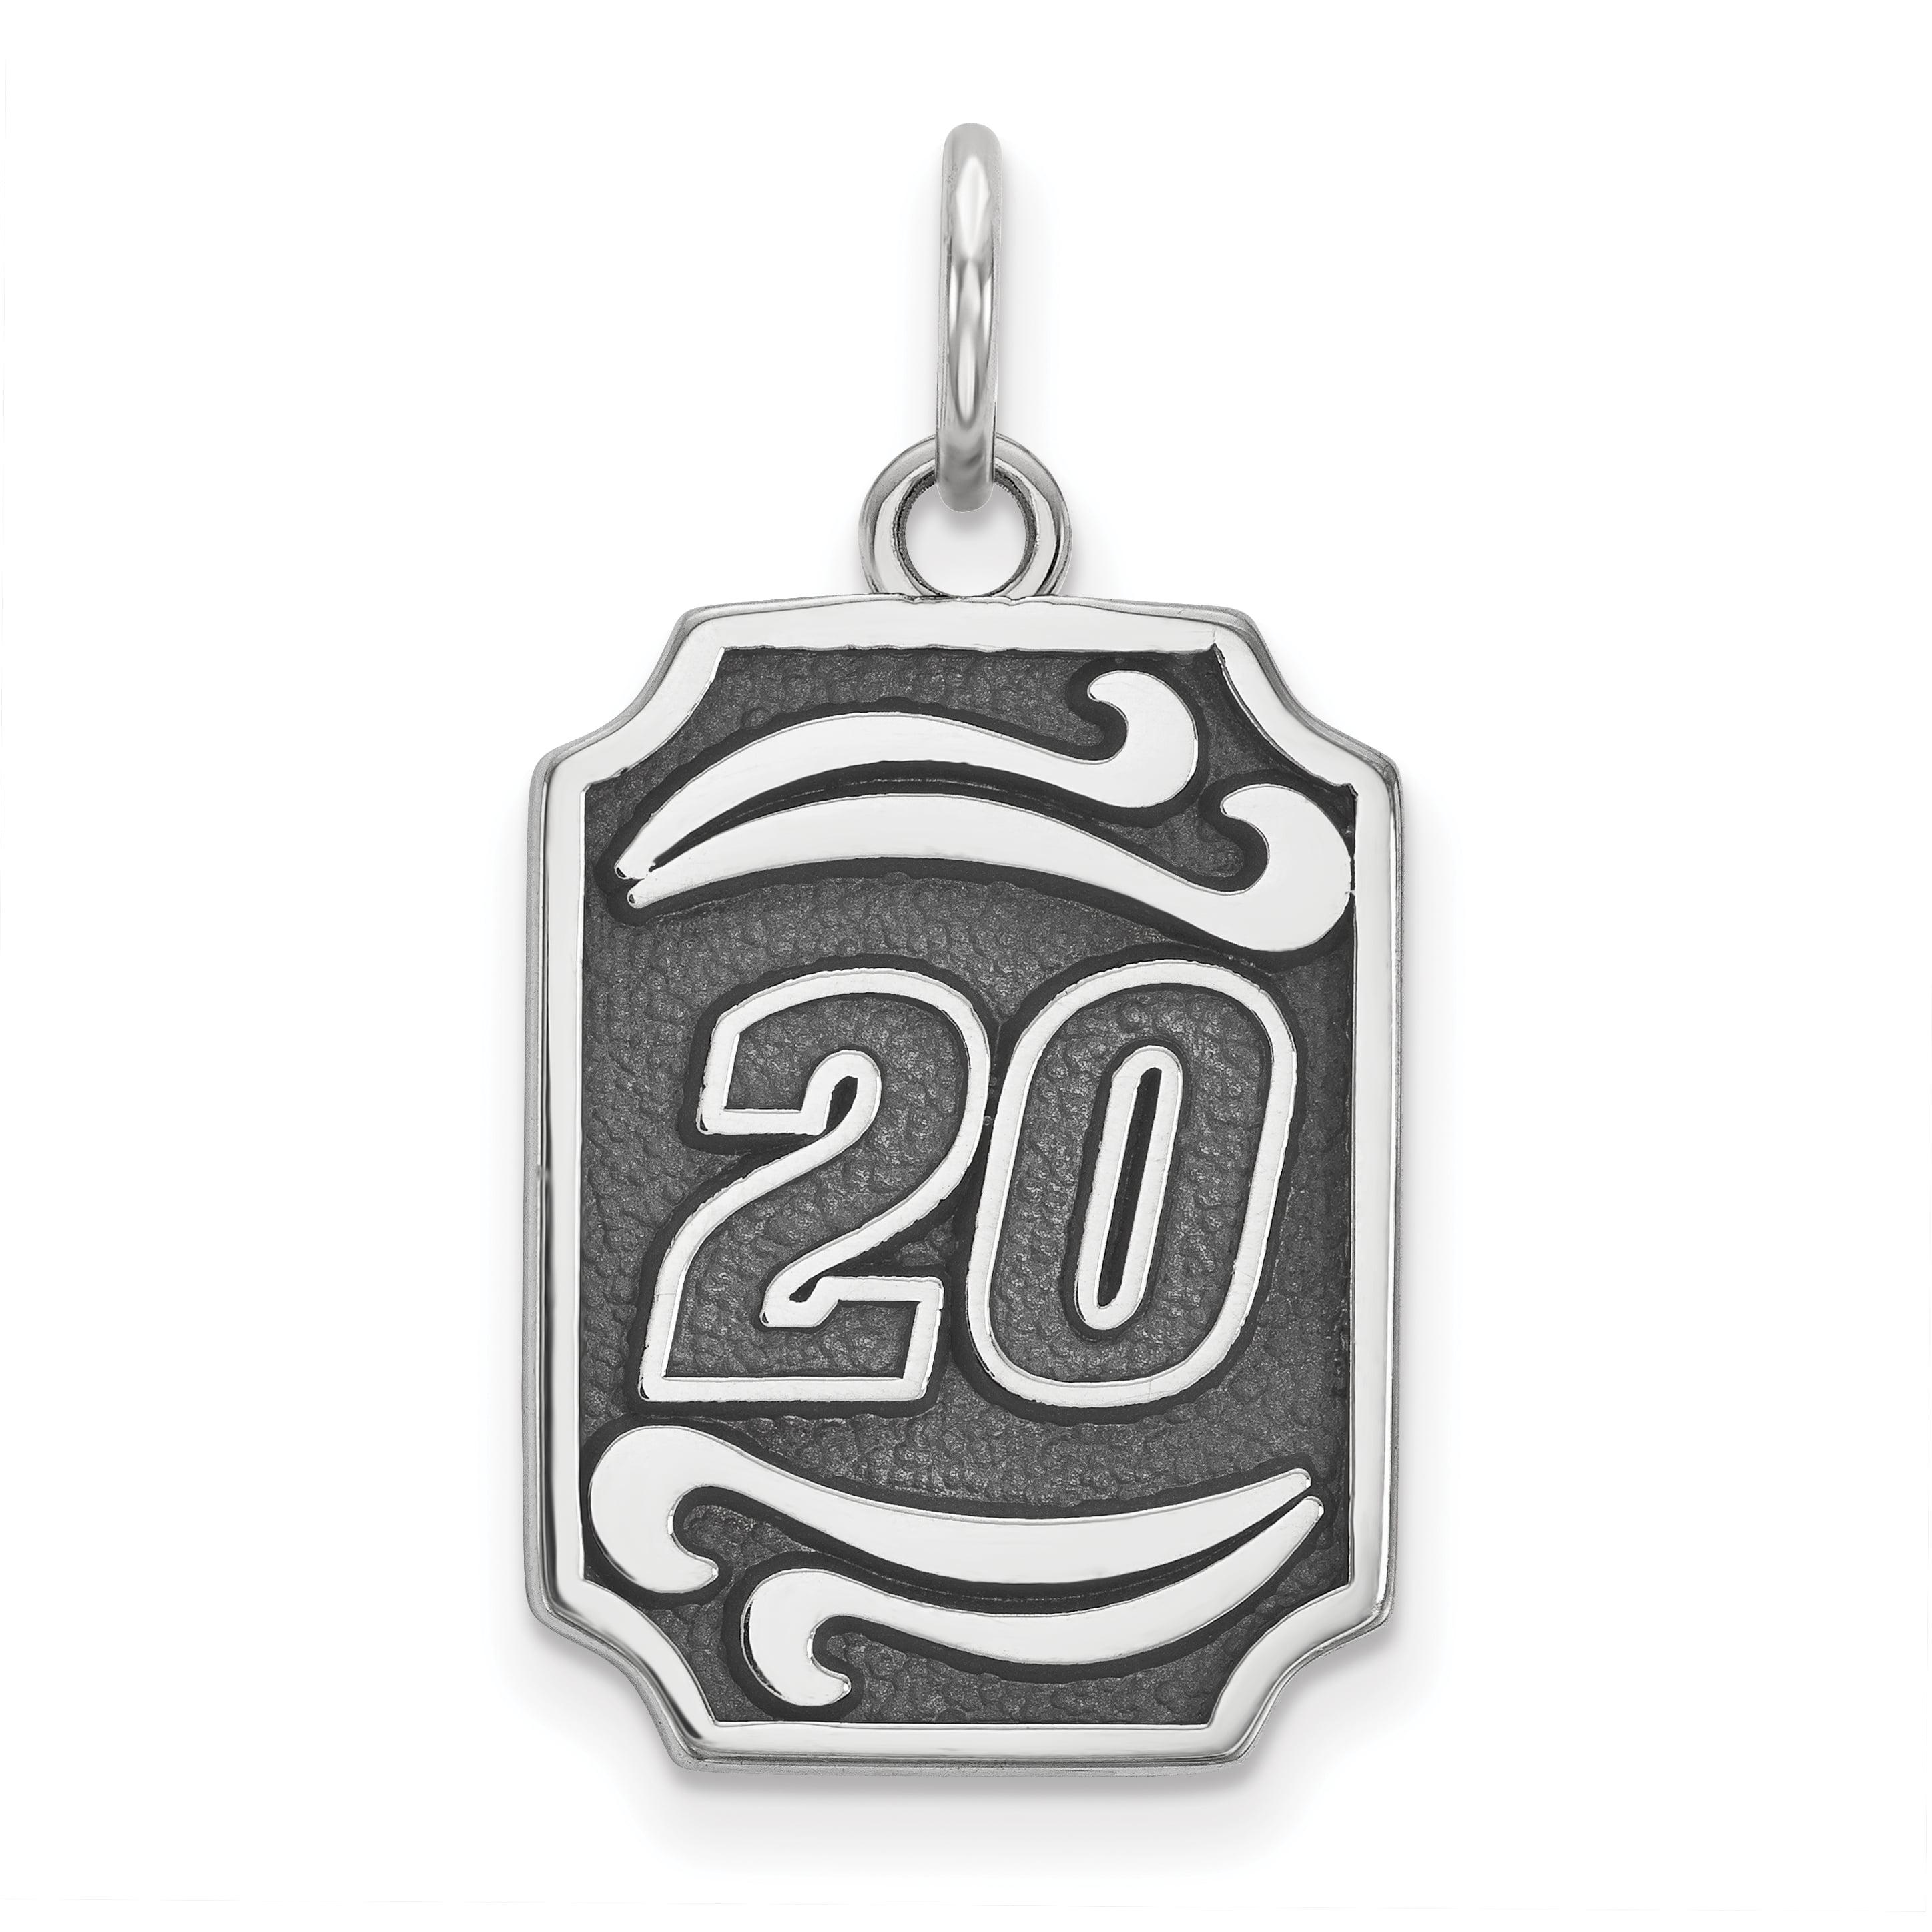 STERLING SILVER LogoArt Official Licensed NASCAR BALI TYPE VERTICAL PEND 20 MATT KENSETH